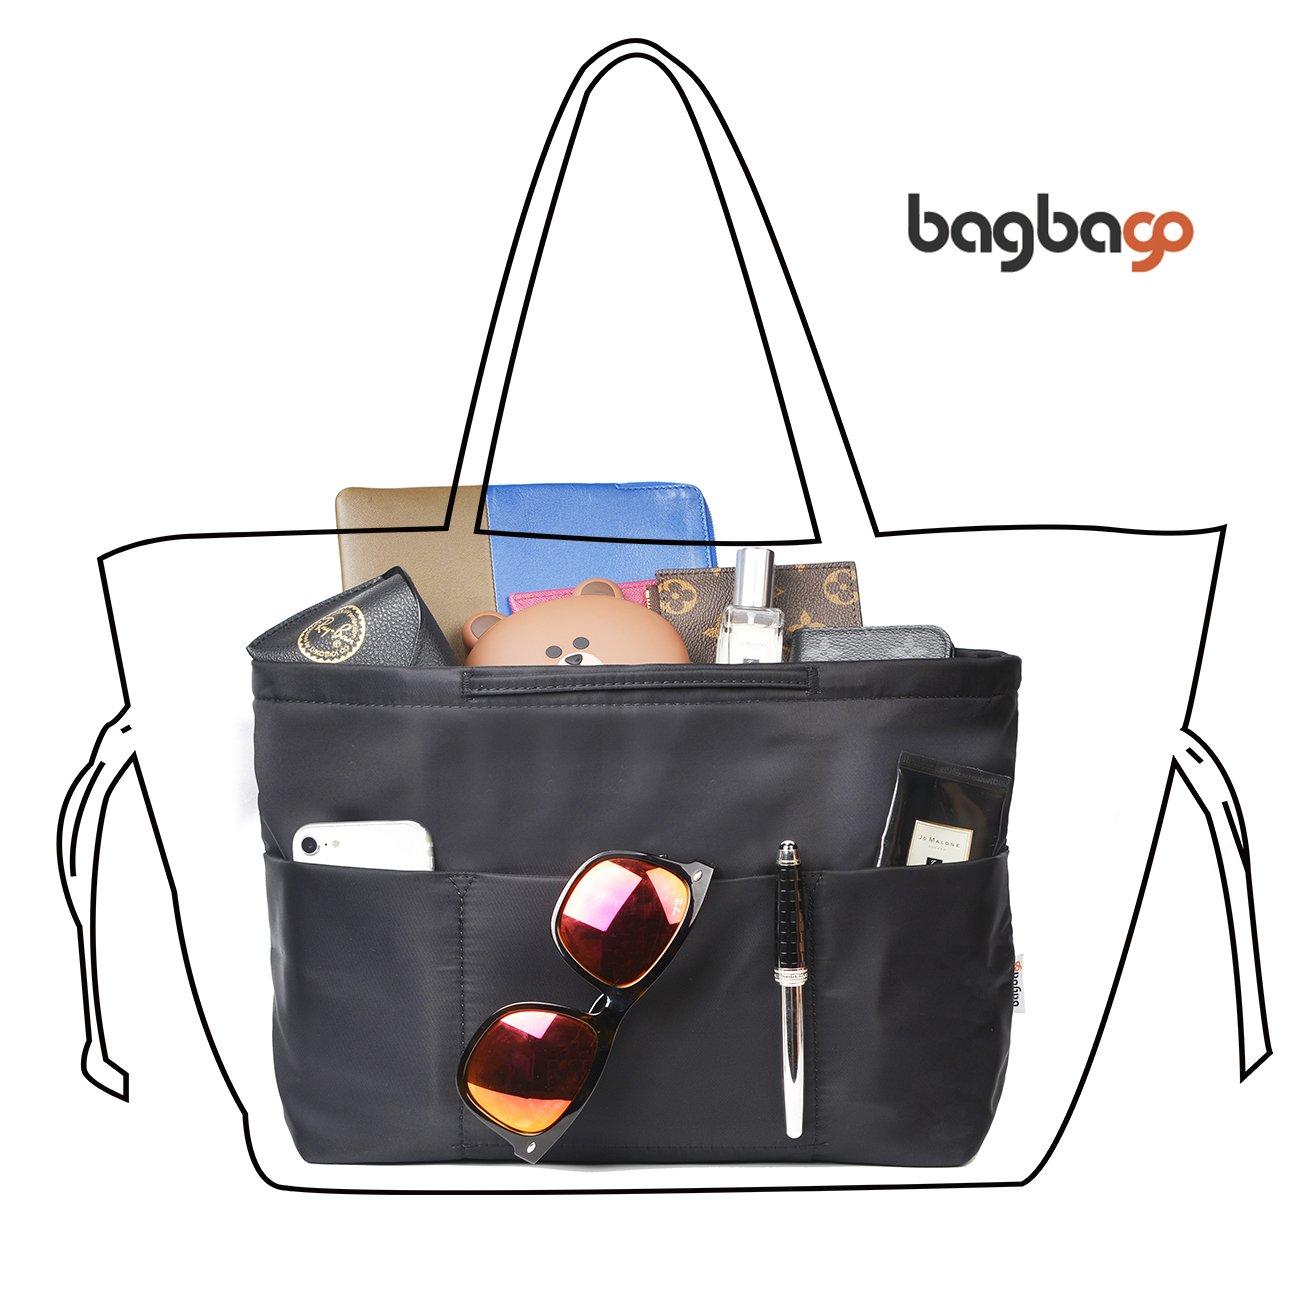 BES CHAN Bag in Bag Handbag Wallet Purse Insert Organizer Luxury Package Anti-Theft Bag Women fit Neverful L, Black